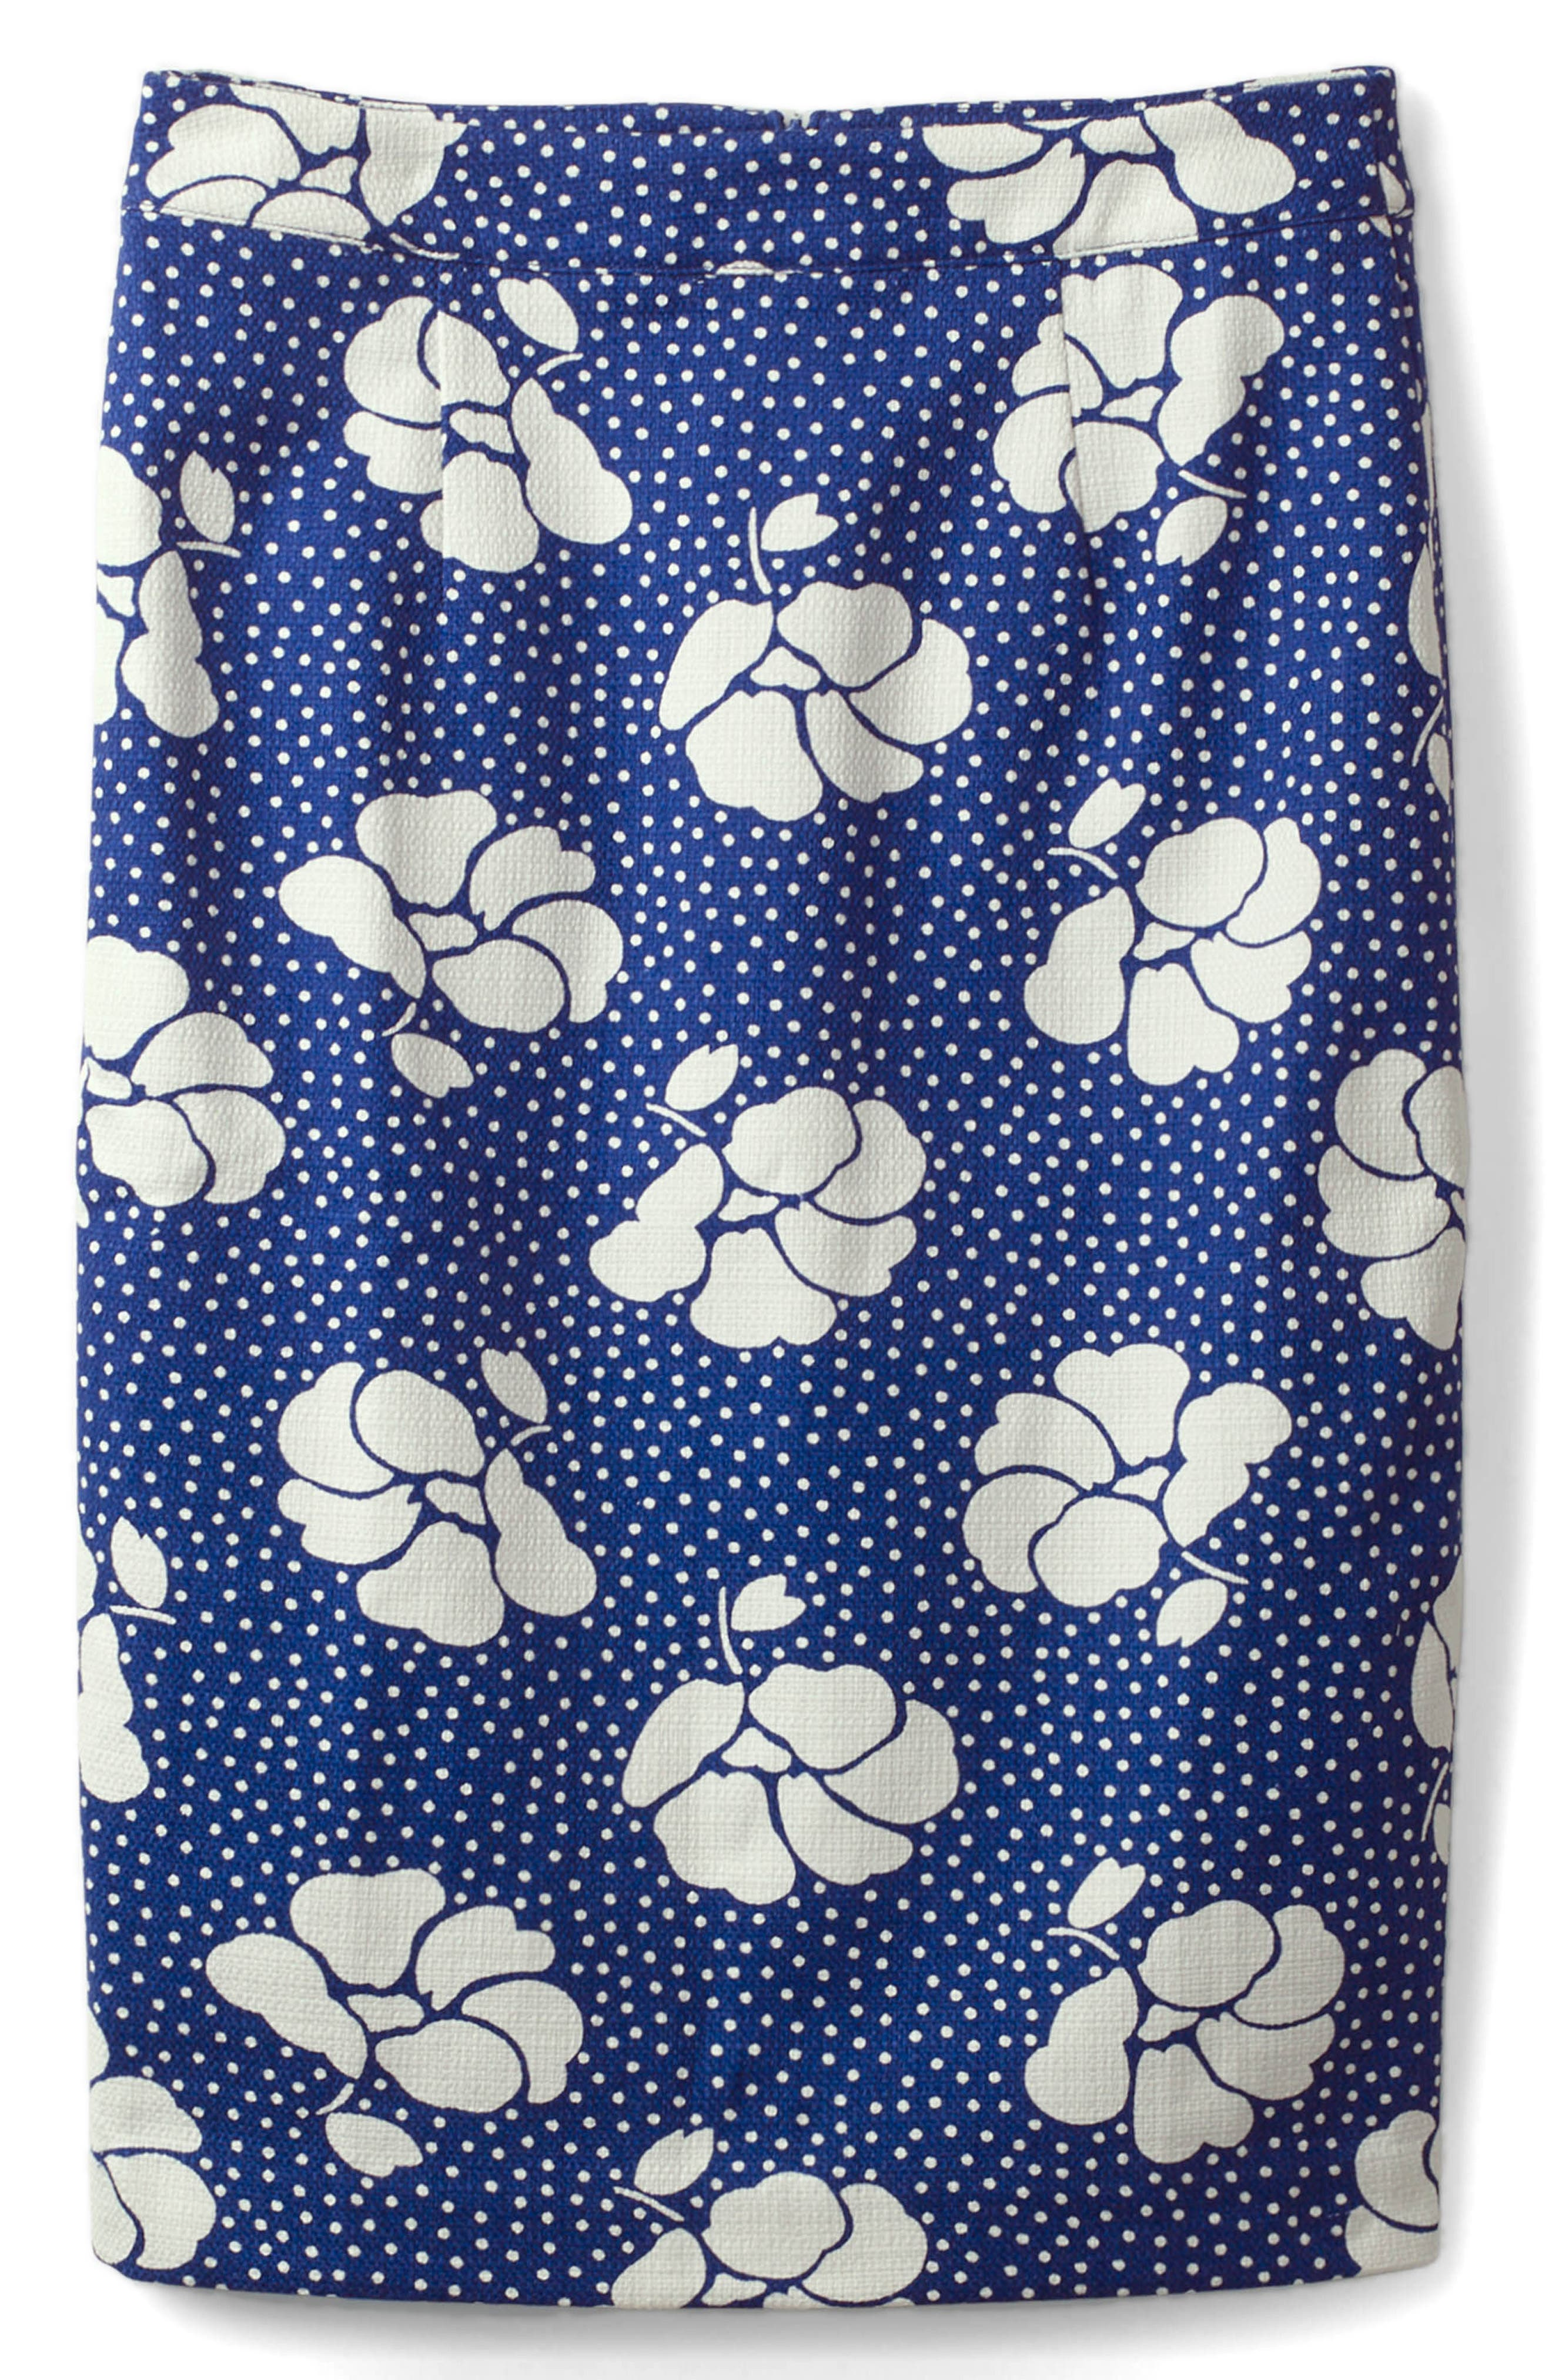 BODEN,                             Martha Floral Pencil Skirt,                             Main thumbnail 1, color,                             304